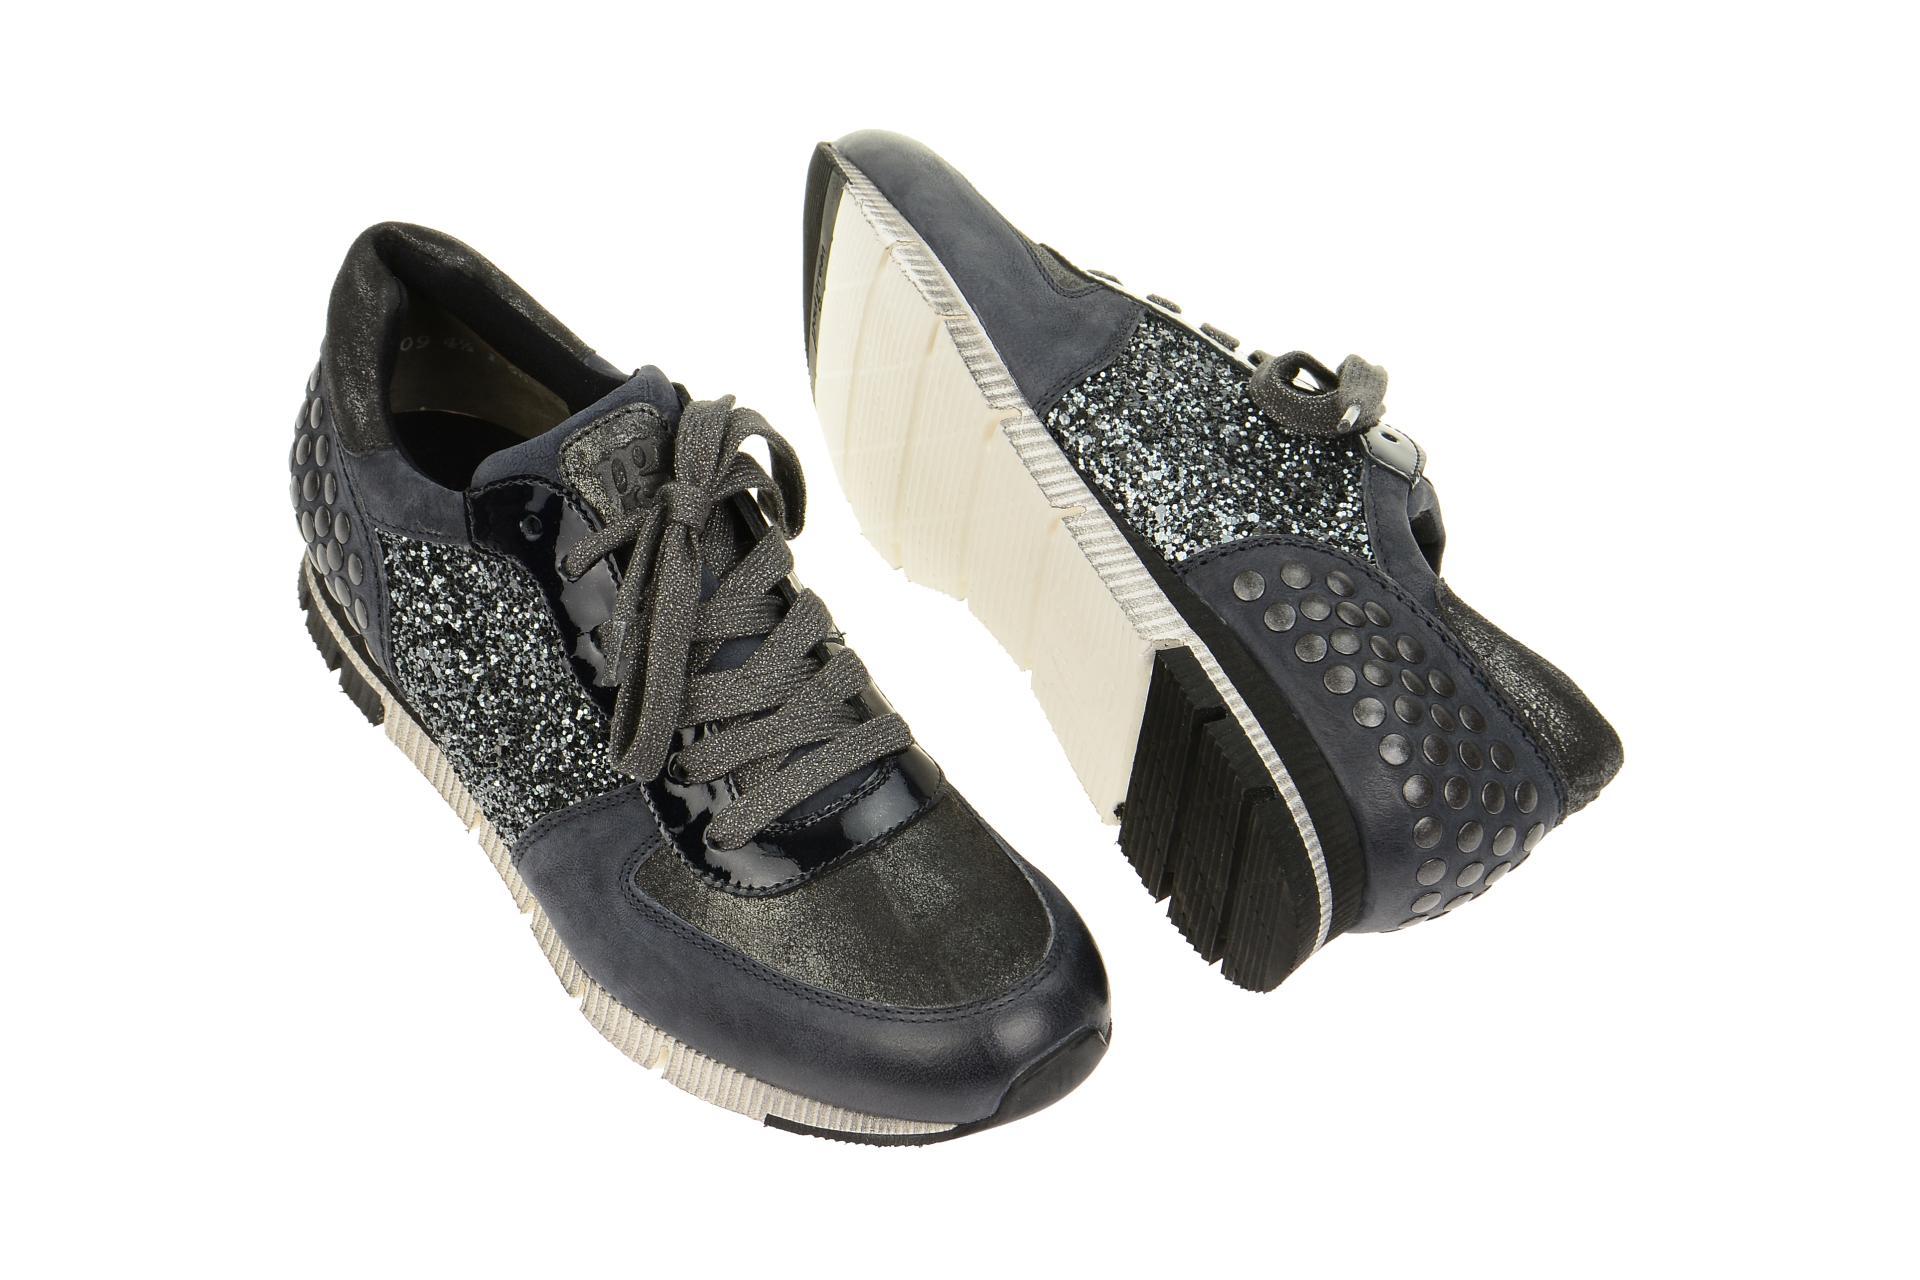 paul green schuhe grau sneakers 4223 076 schuhhaus. Black Bedroom Furniture Sets. Home Design Ideas